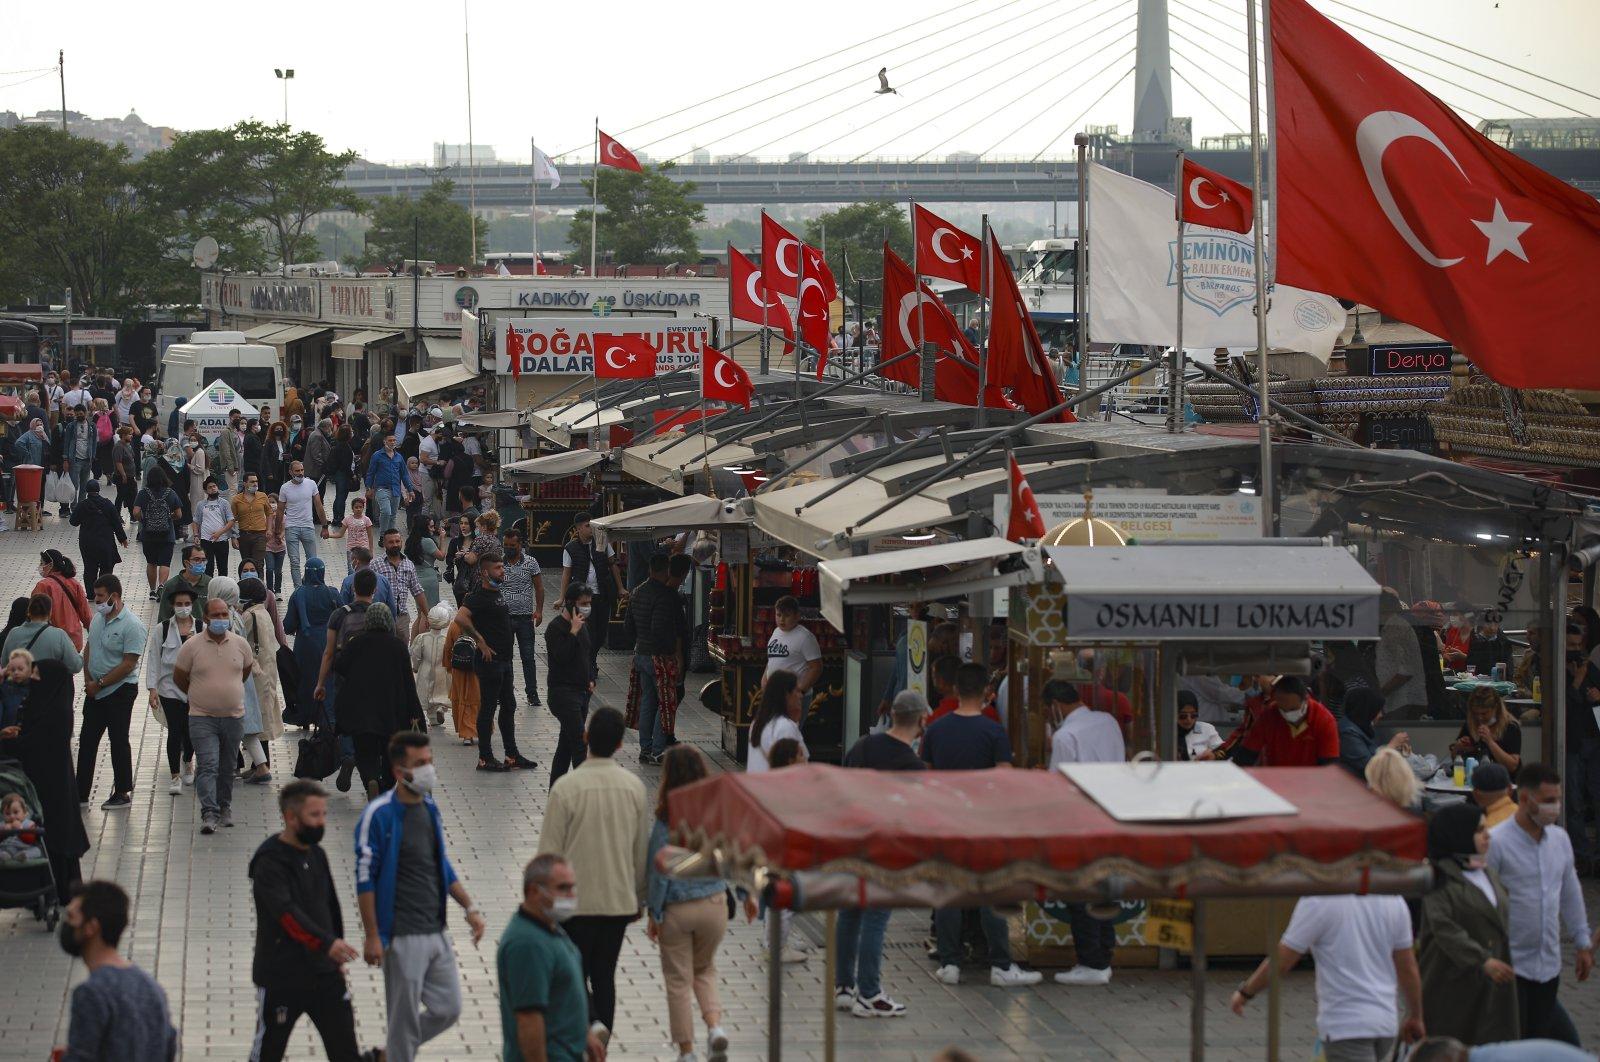 People in protective face masks walk amid the coronavirus pandemic, Eminönü, Istanbul, Turkey, May 28, 2021. (AP Photo)